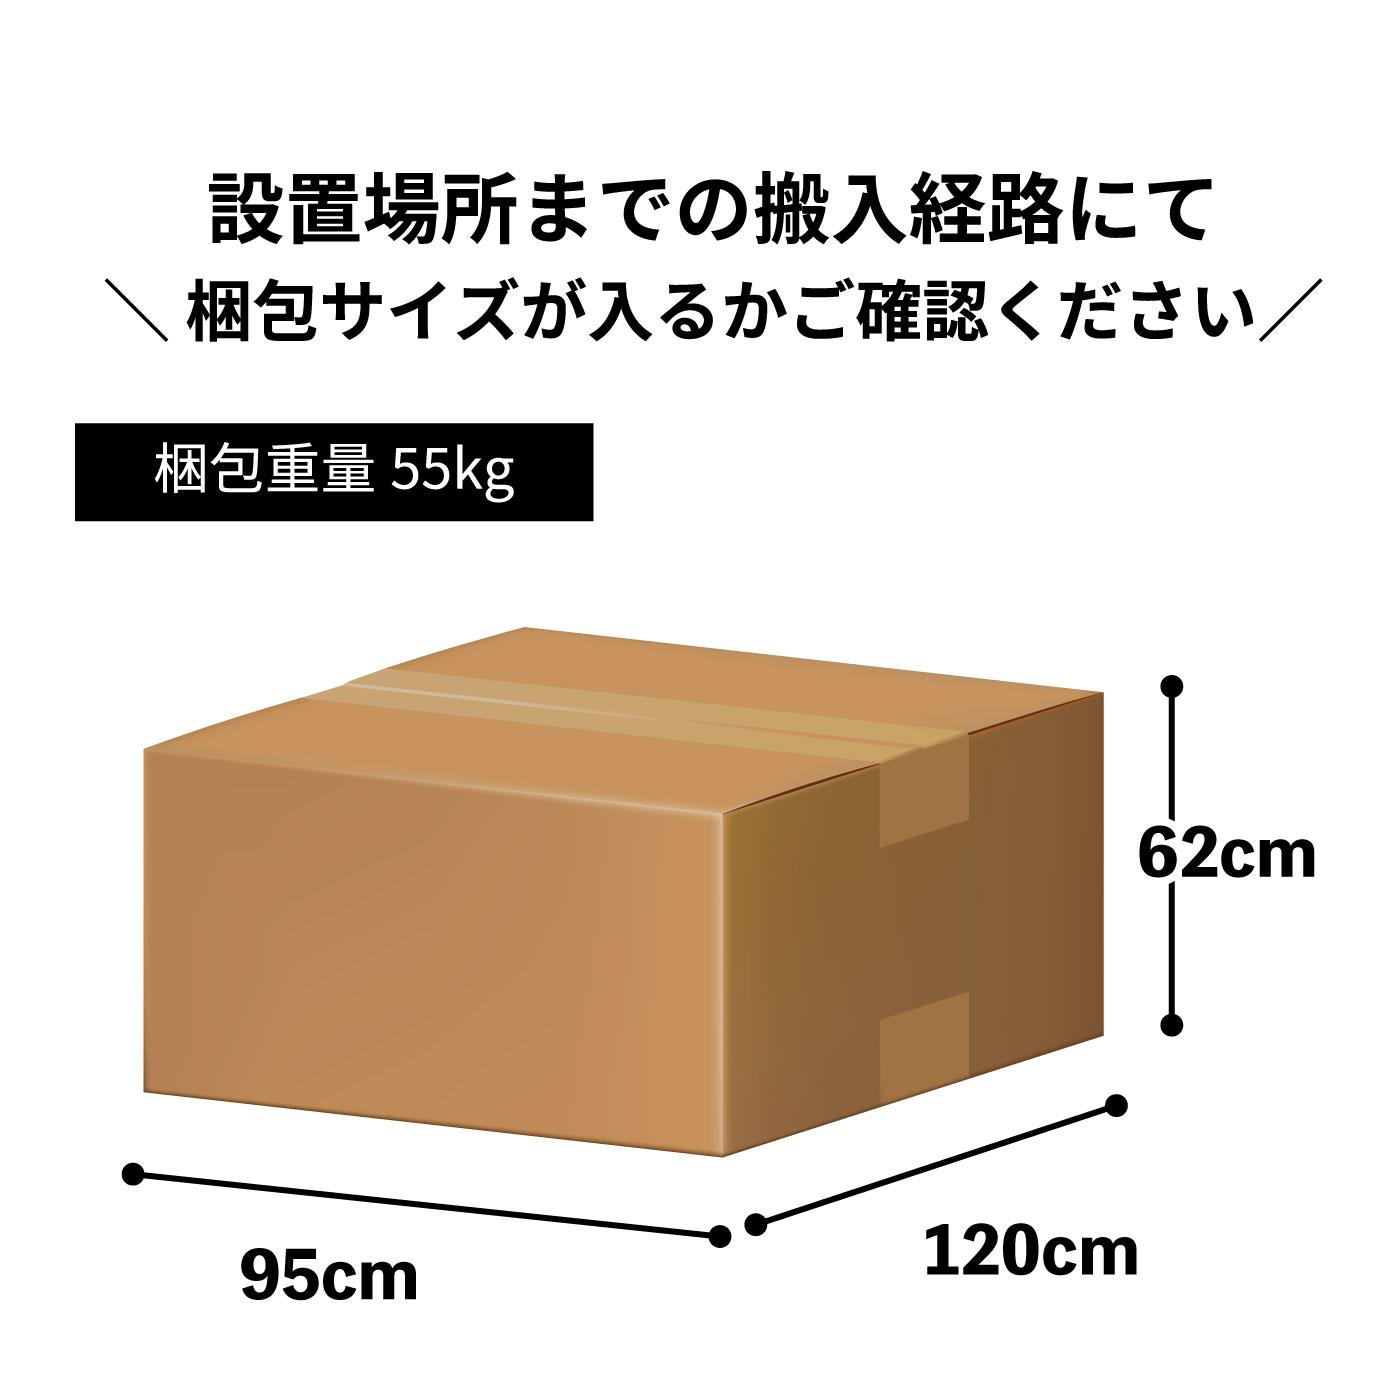 DK-1208の梱包サイズ